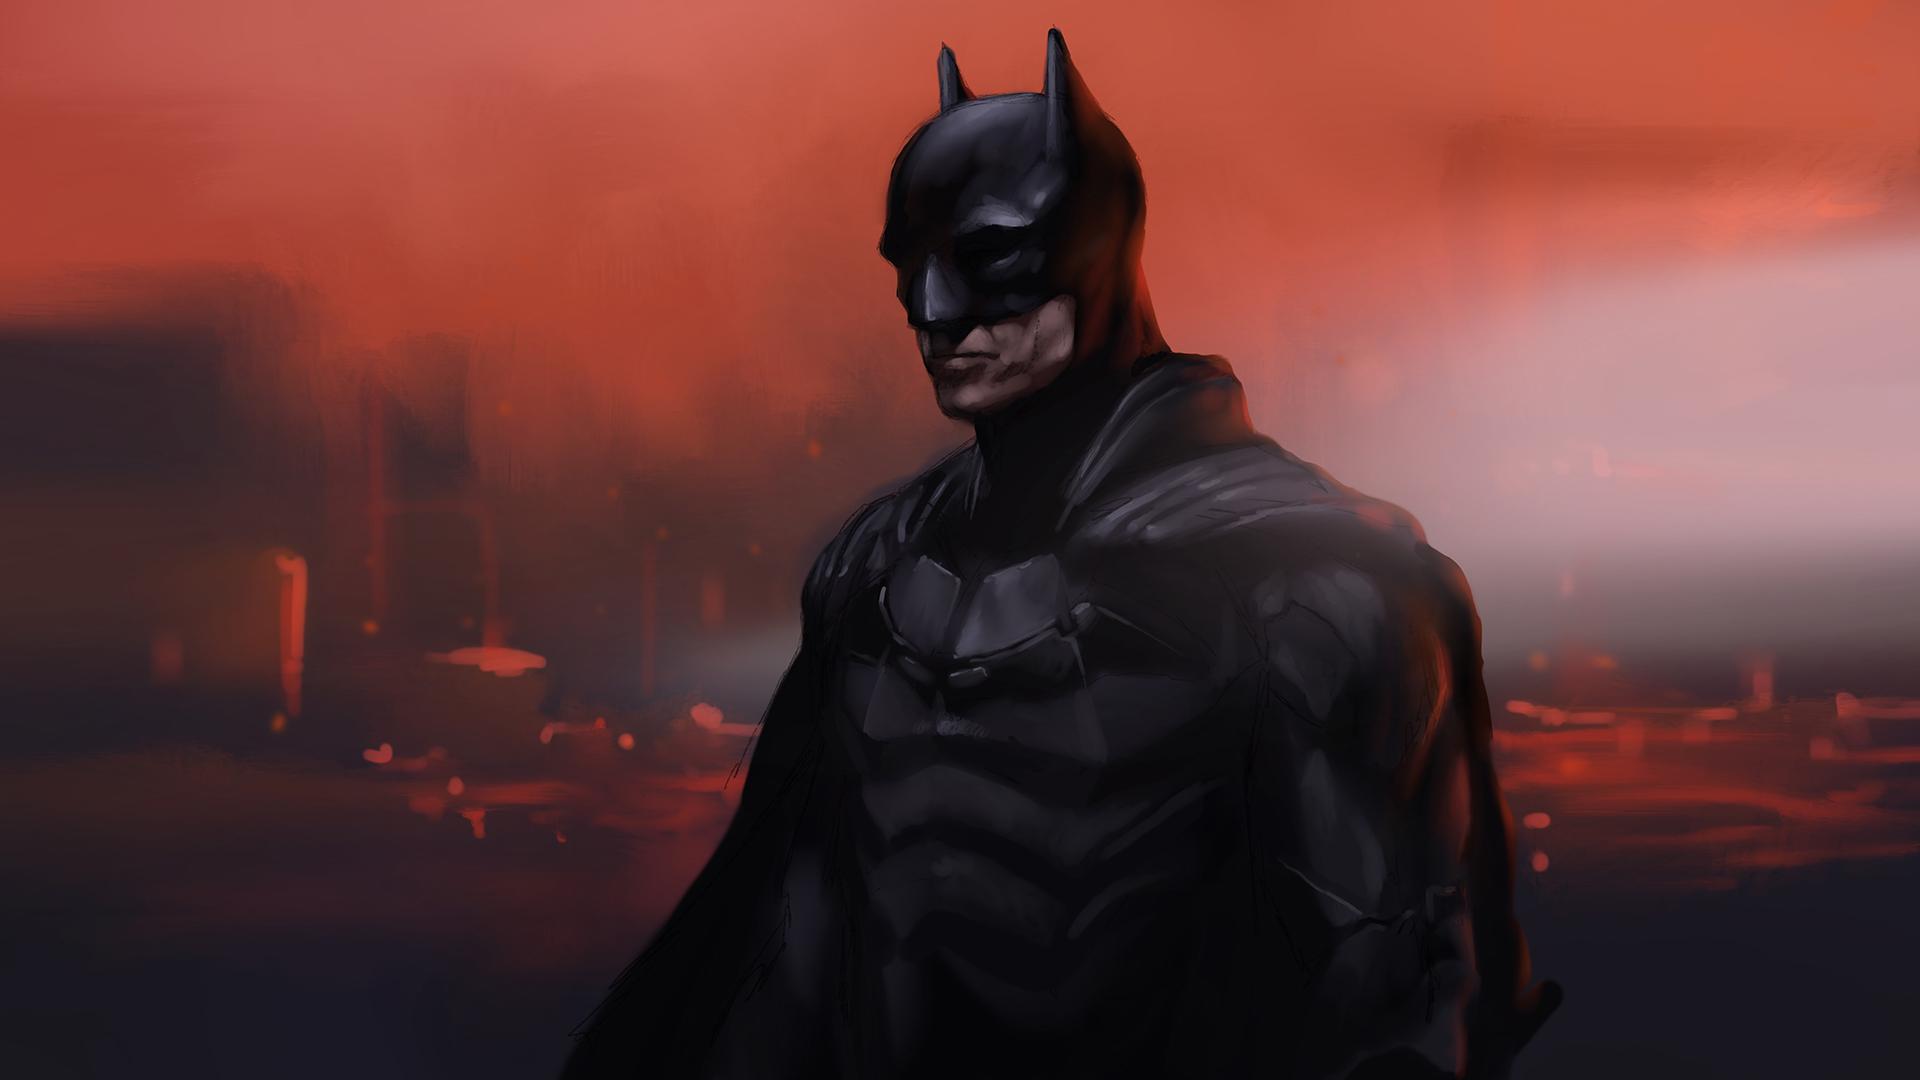 Procreate the batman stefano marvulli